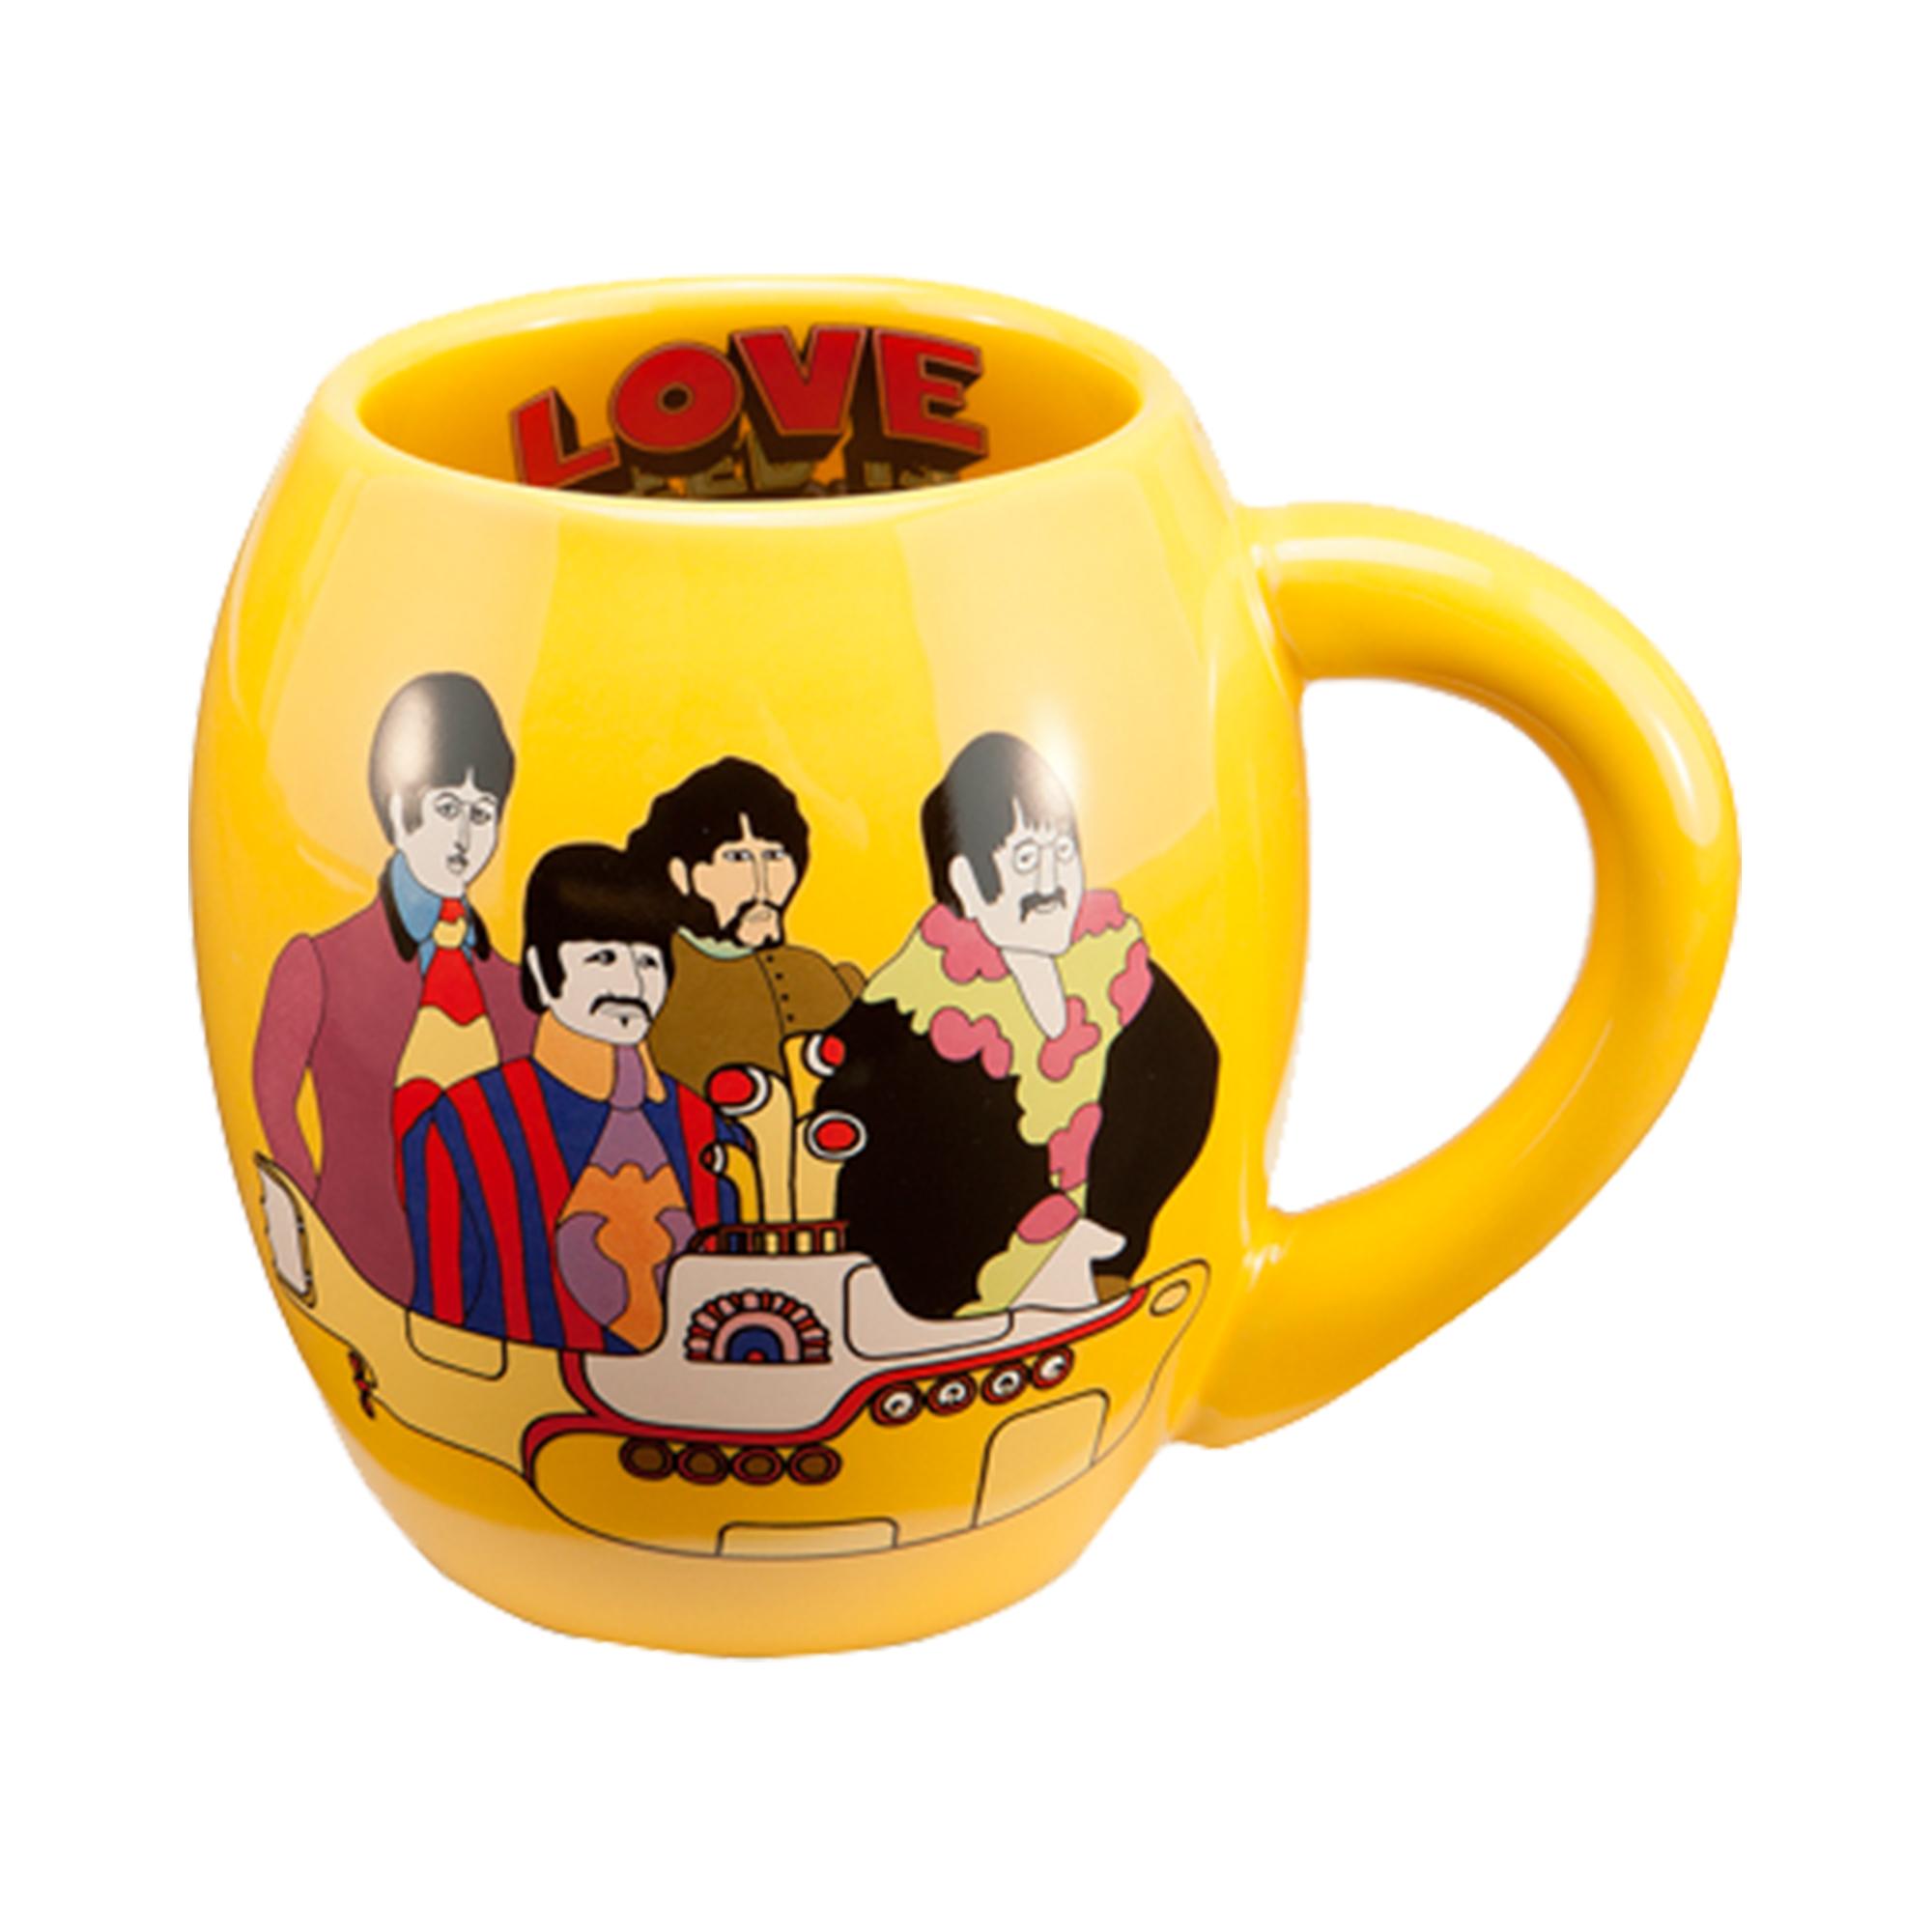 The Beatles Yellow Submarine Ceramic Mug